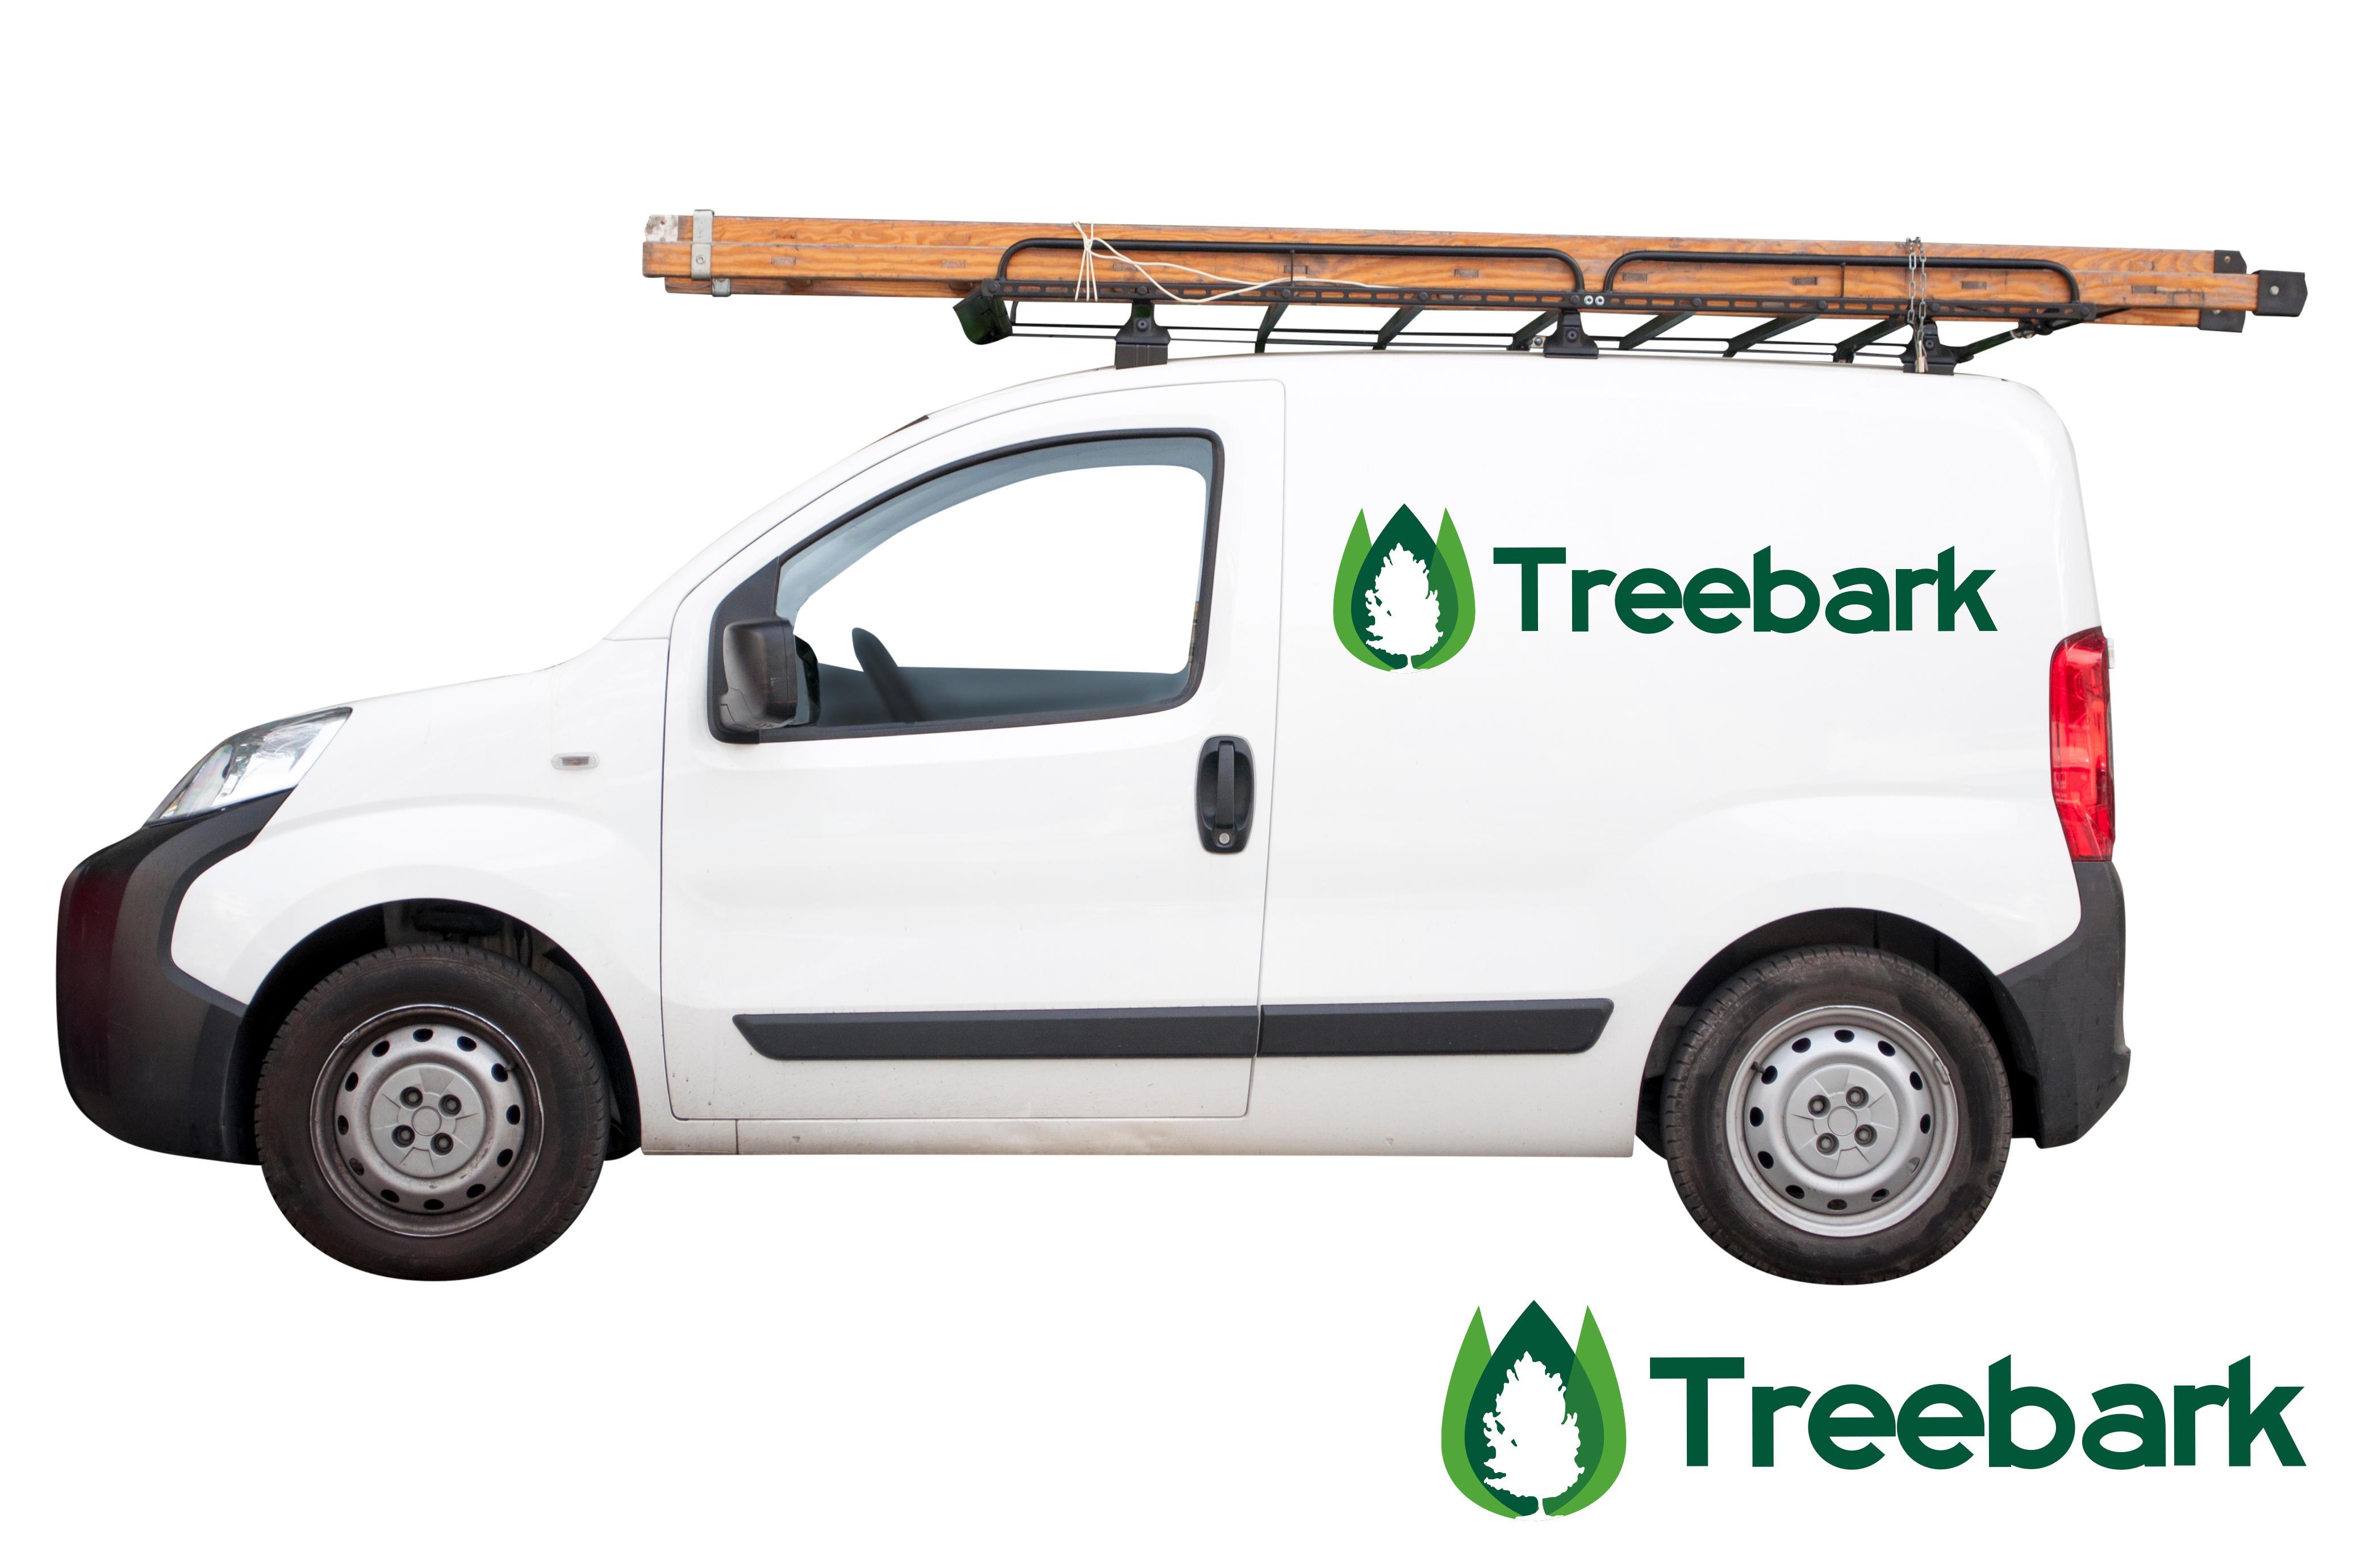 Treebark Termite and Pest Control image 4